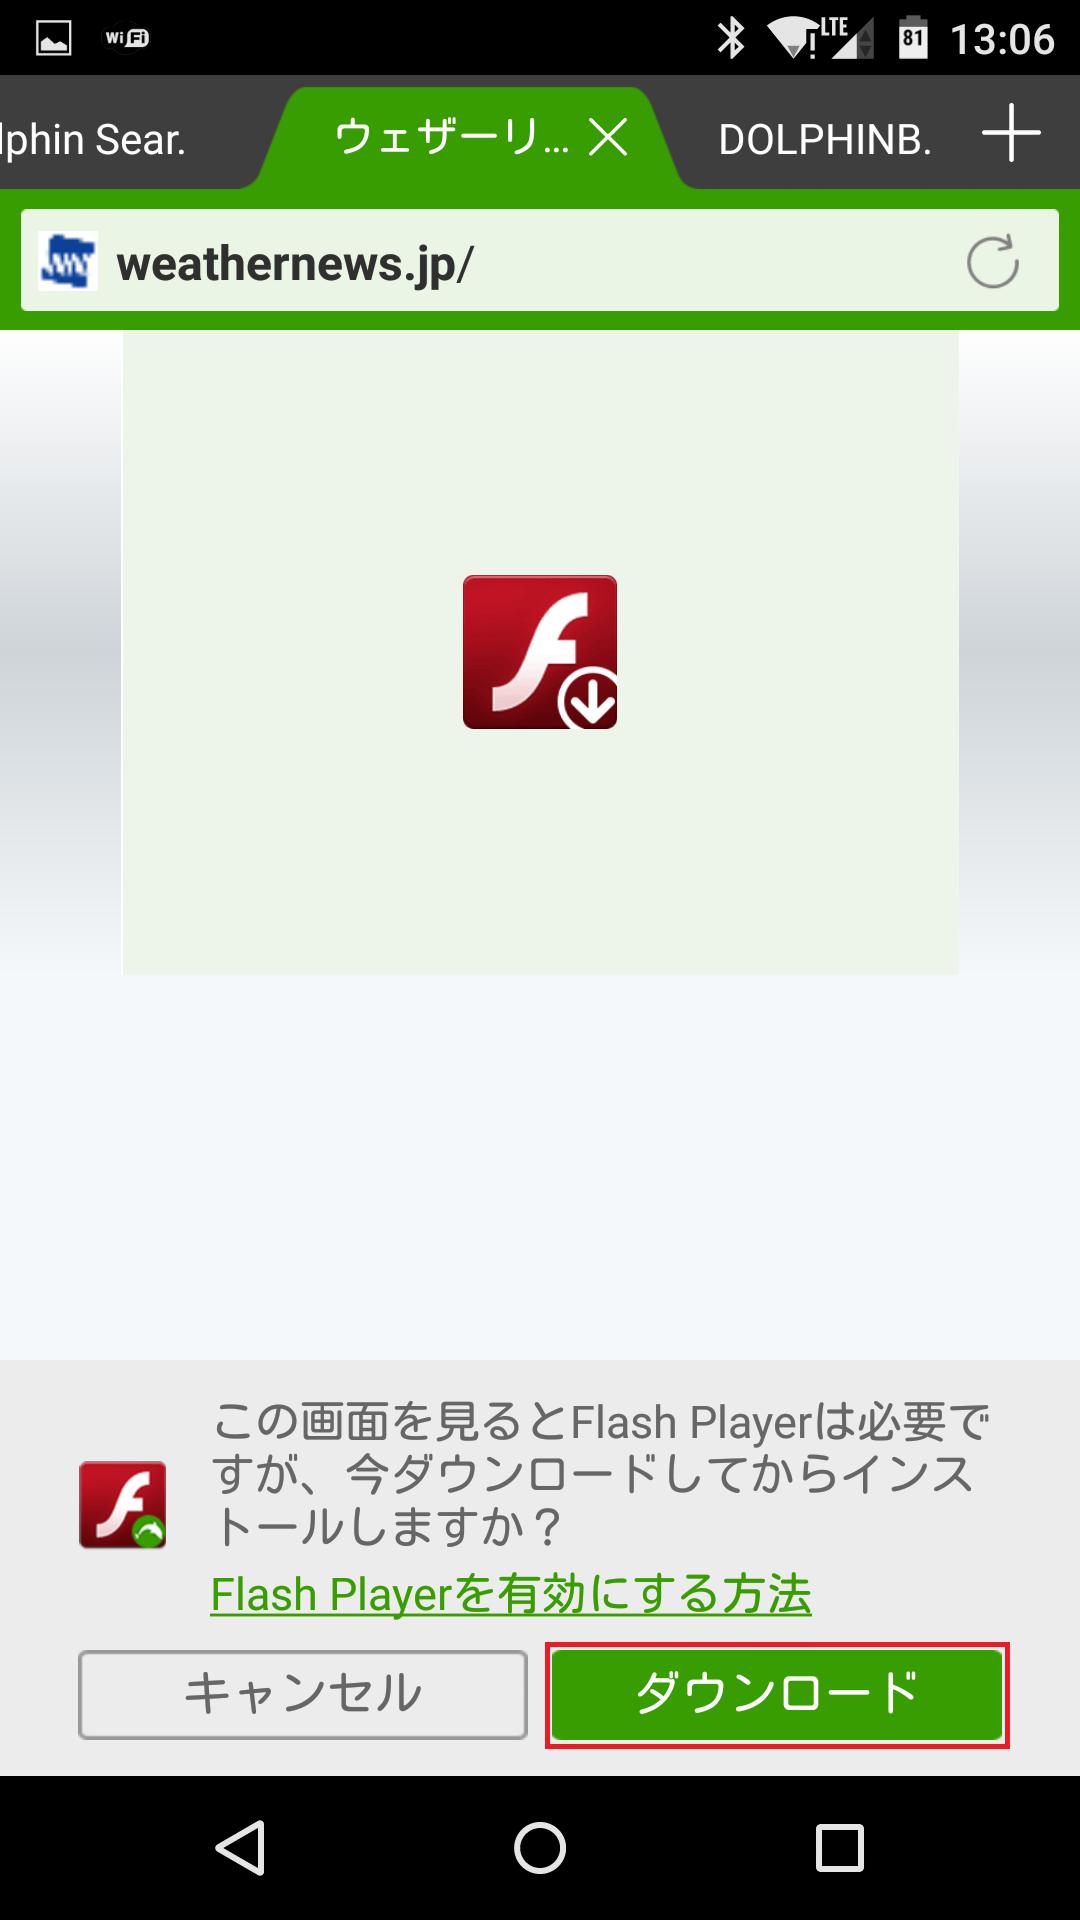 Dolphin Emulator Pro Gold Apk